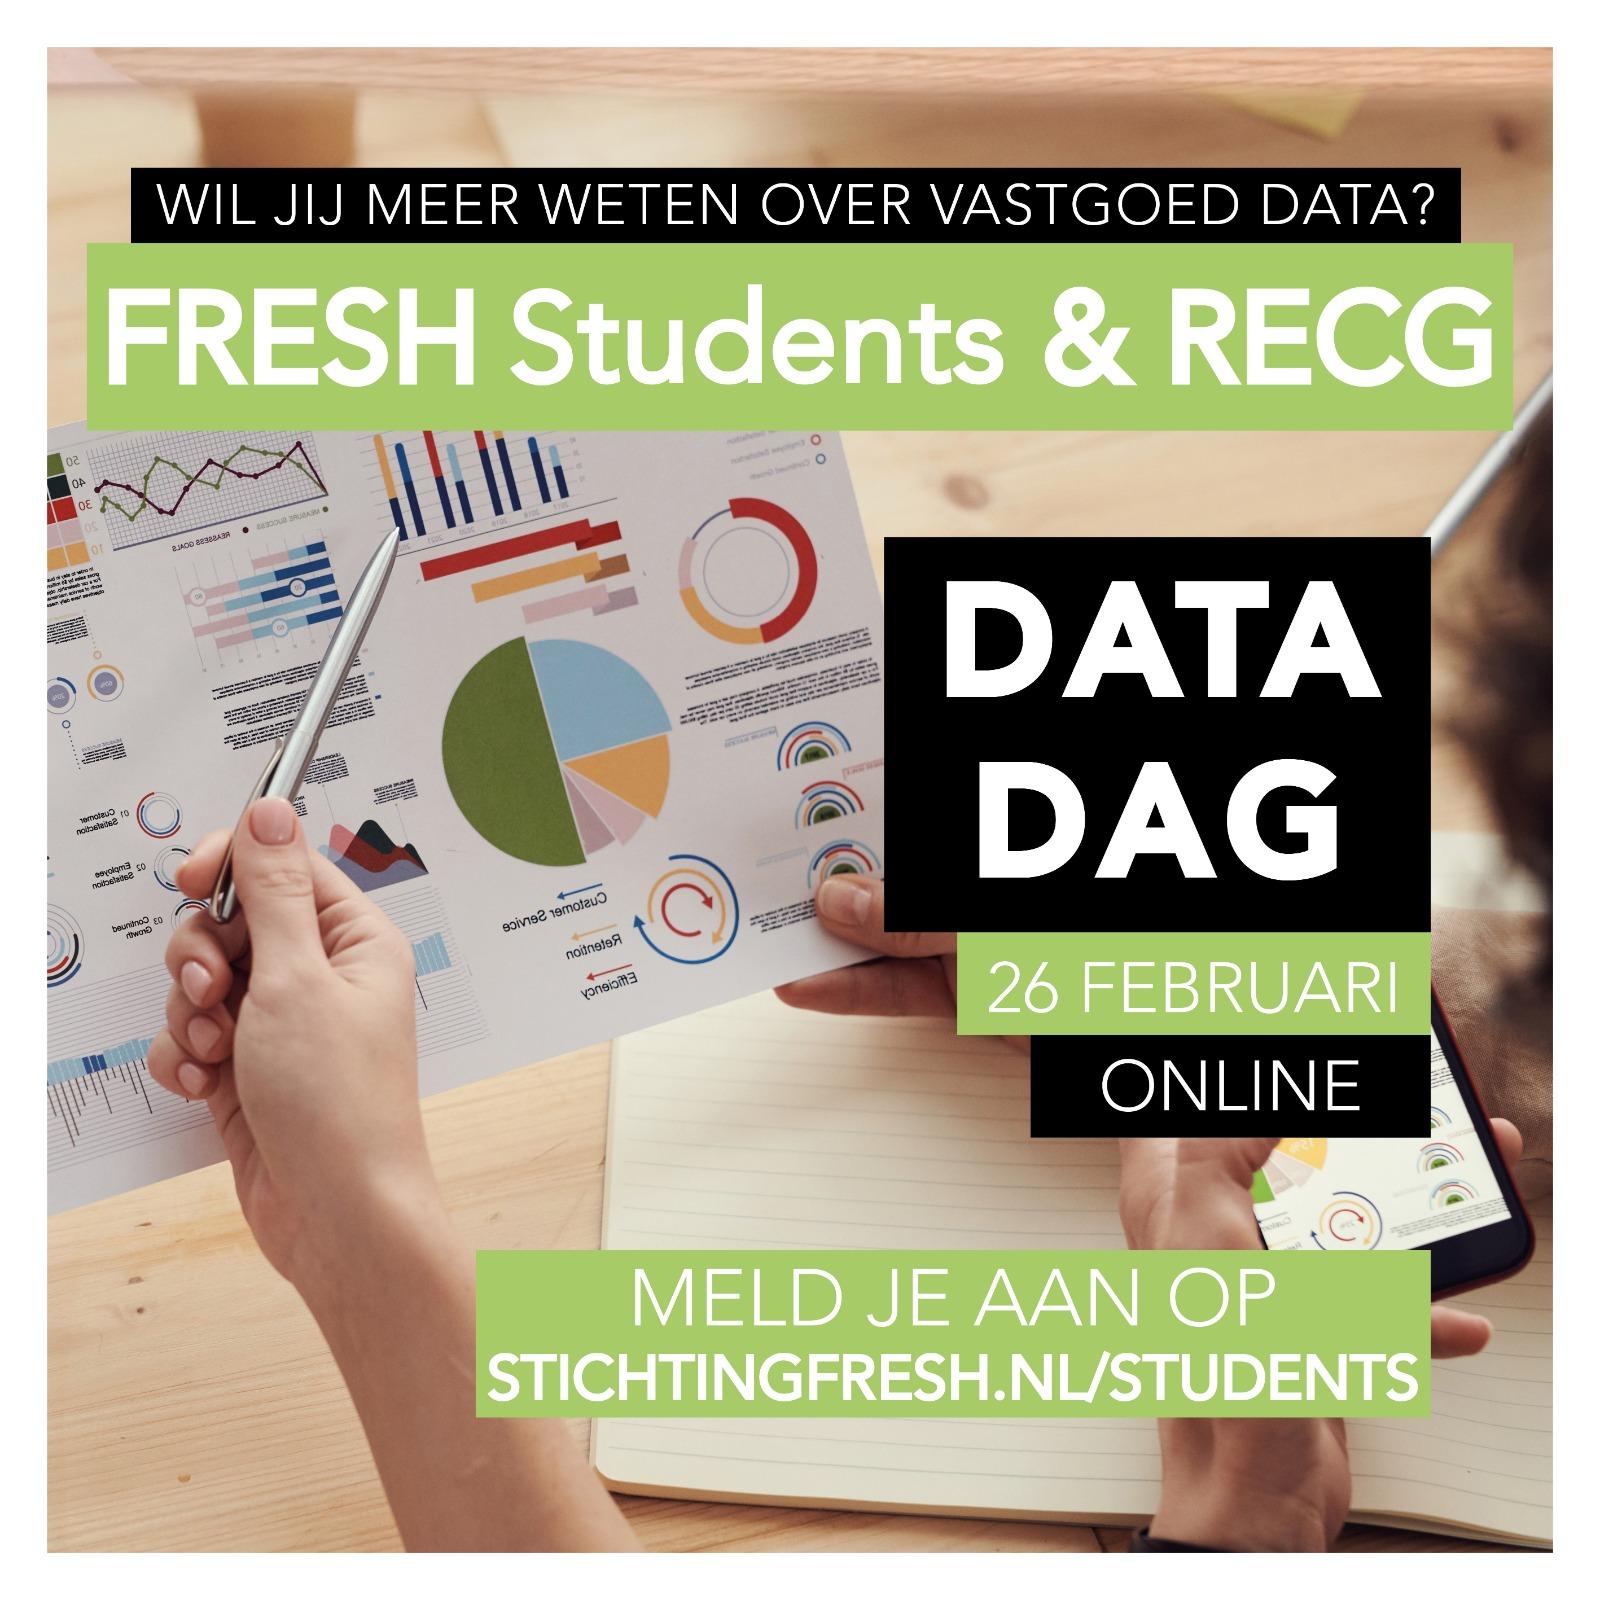 FRESH Students & RECG - Datadag